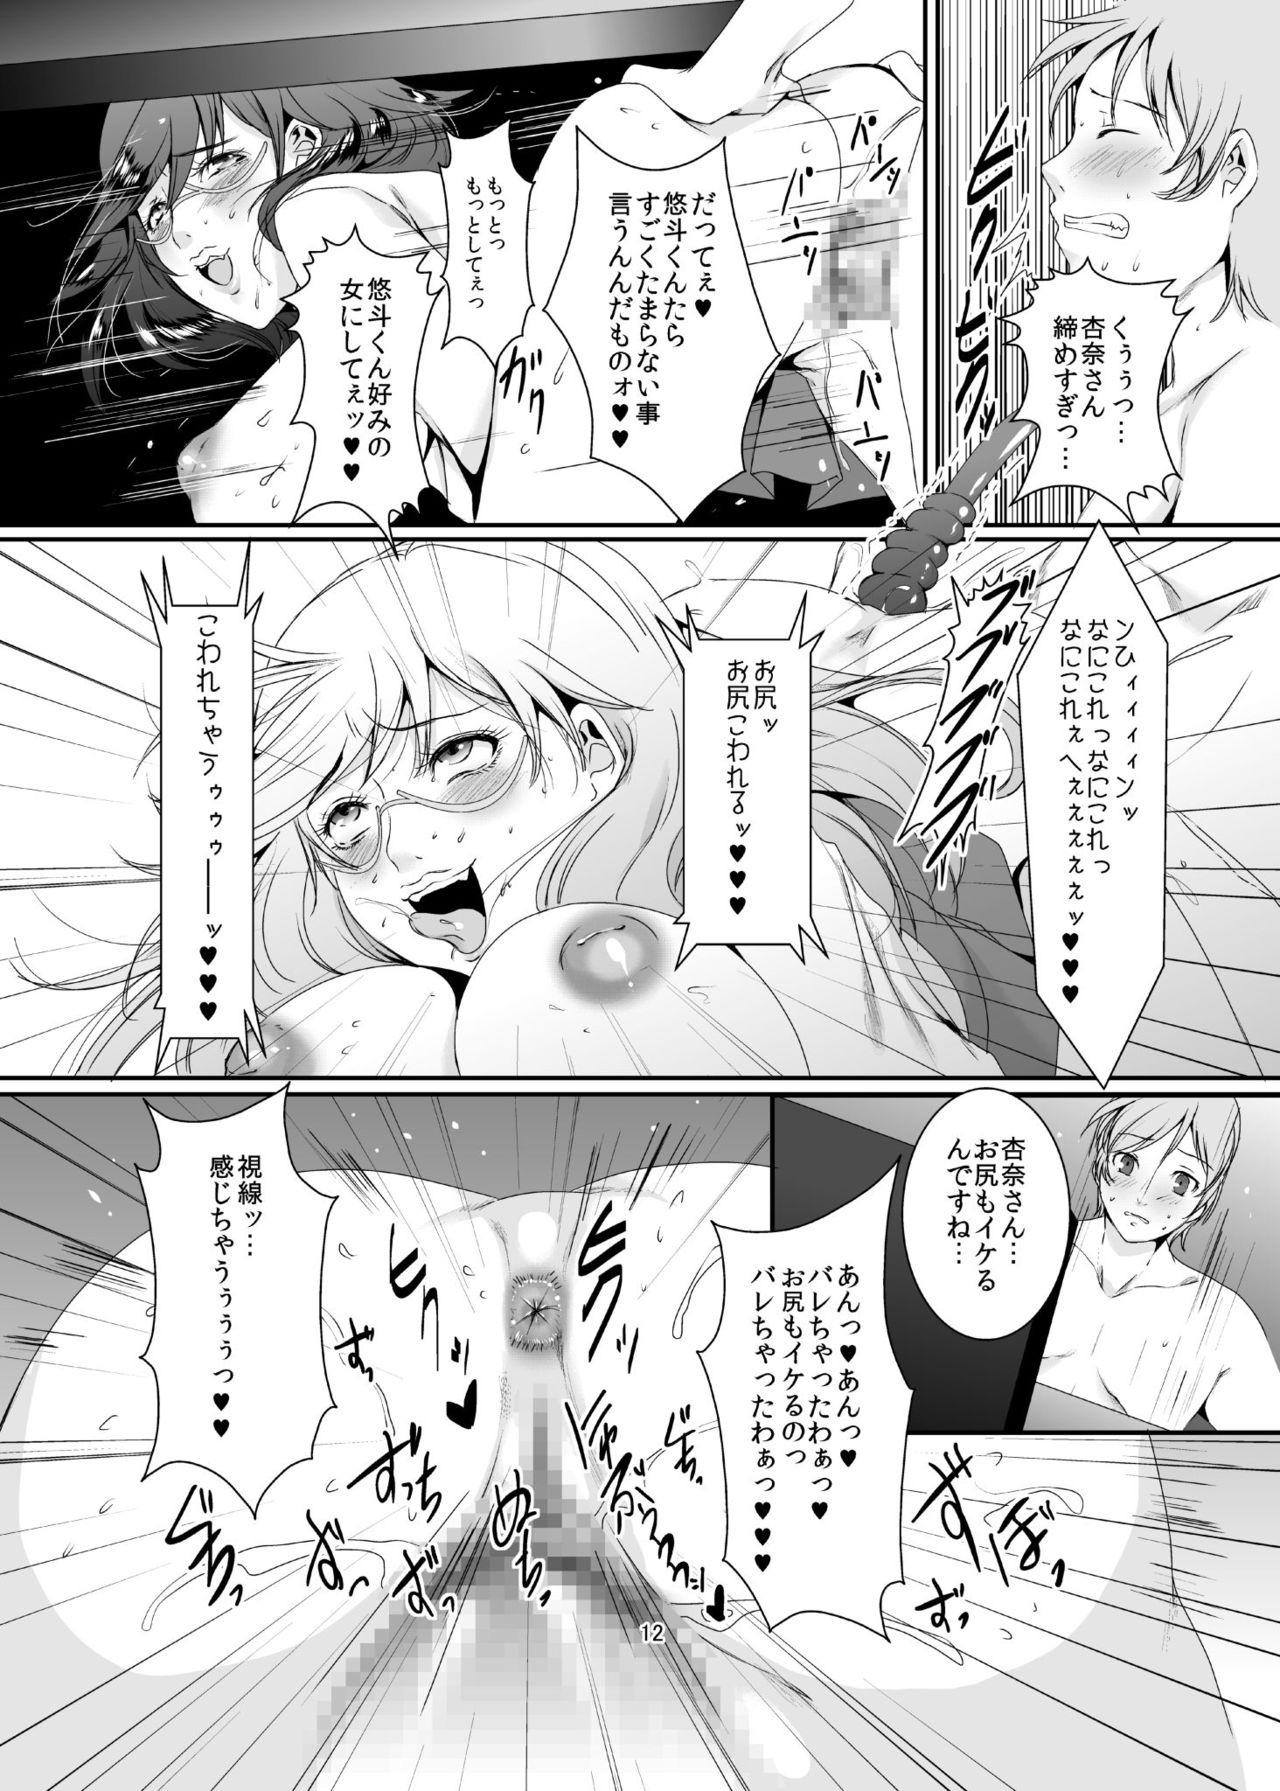 [Sprechchor (Eguchi Chibi)] Oku-sama wa Moto Yariman -Besluted- 5 [Digital] 12